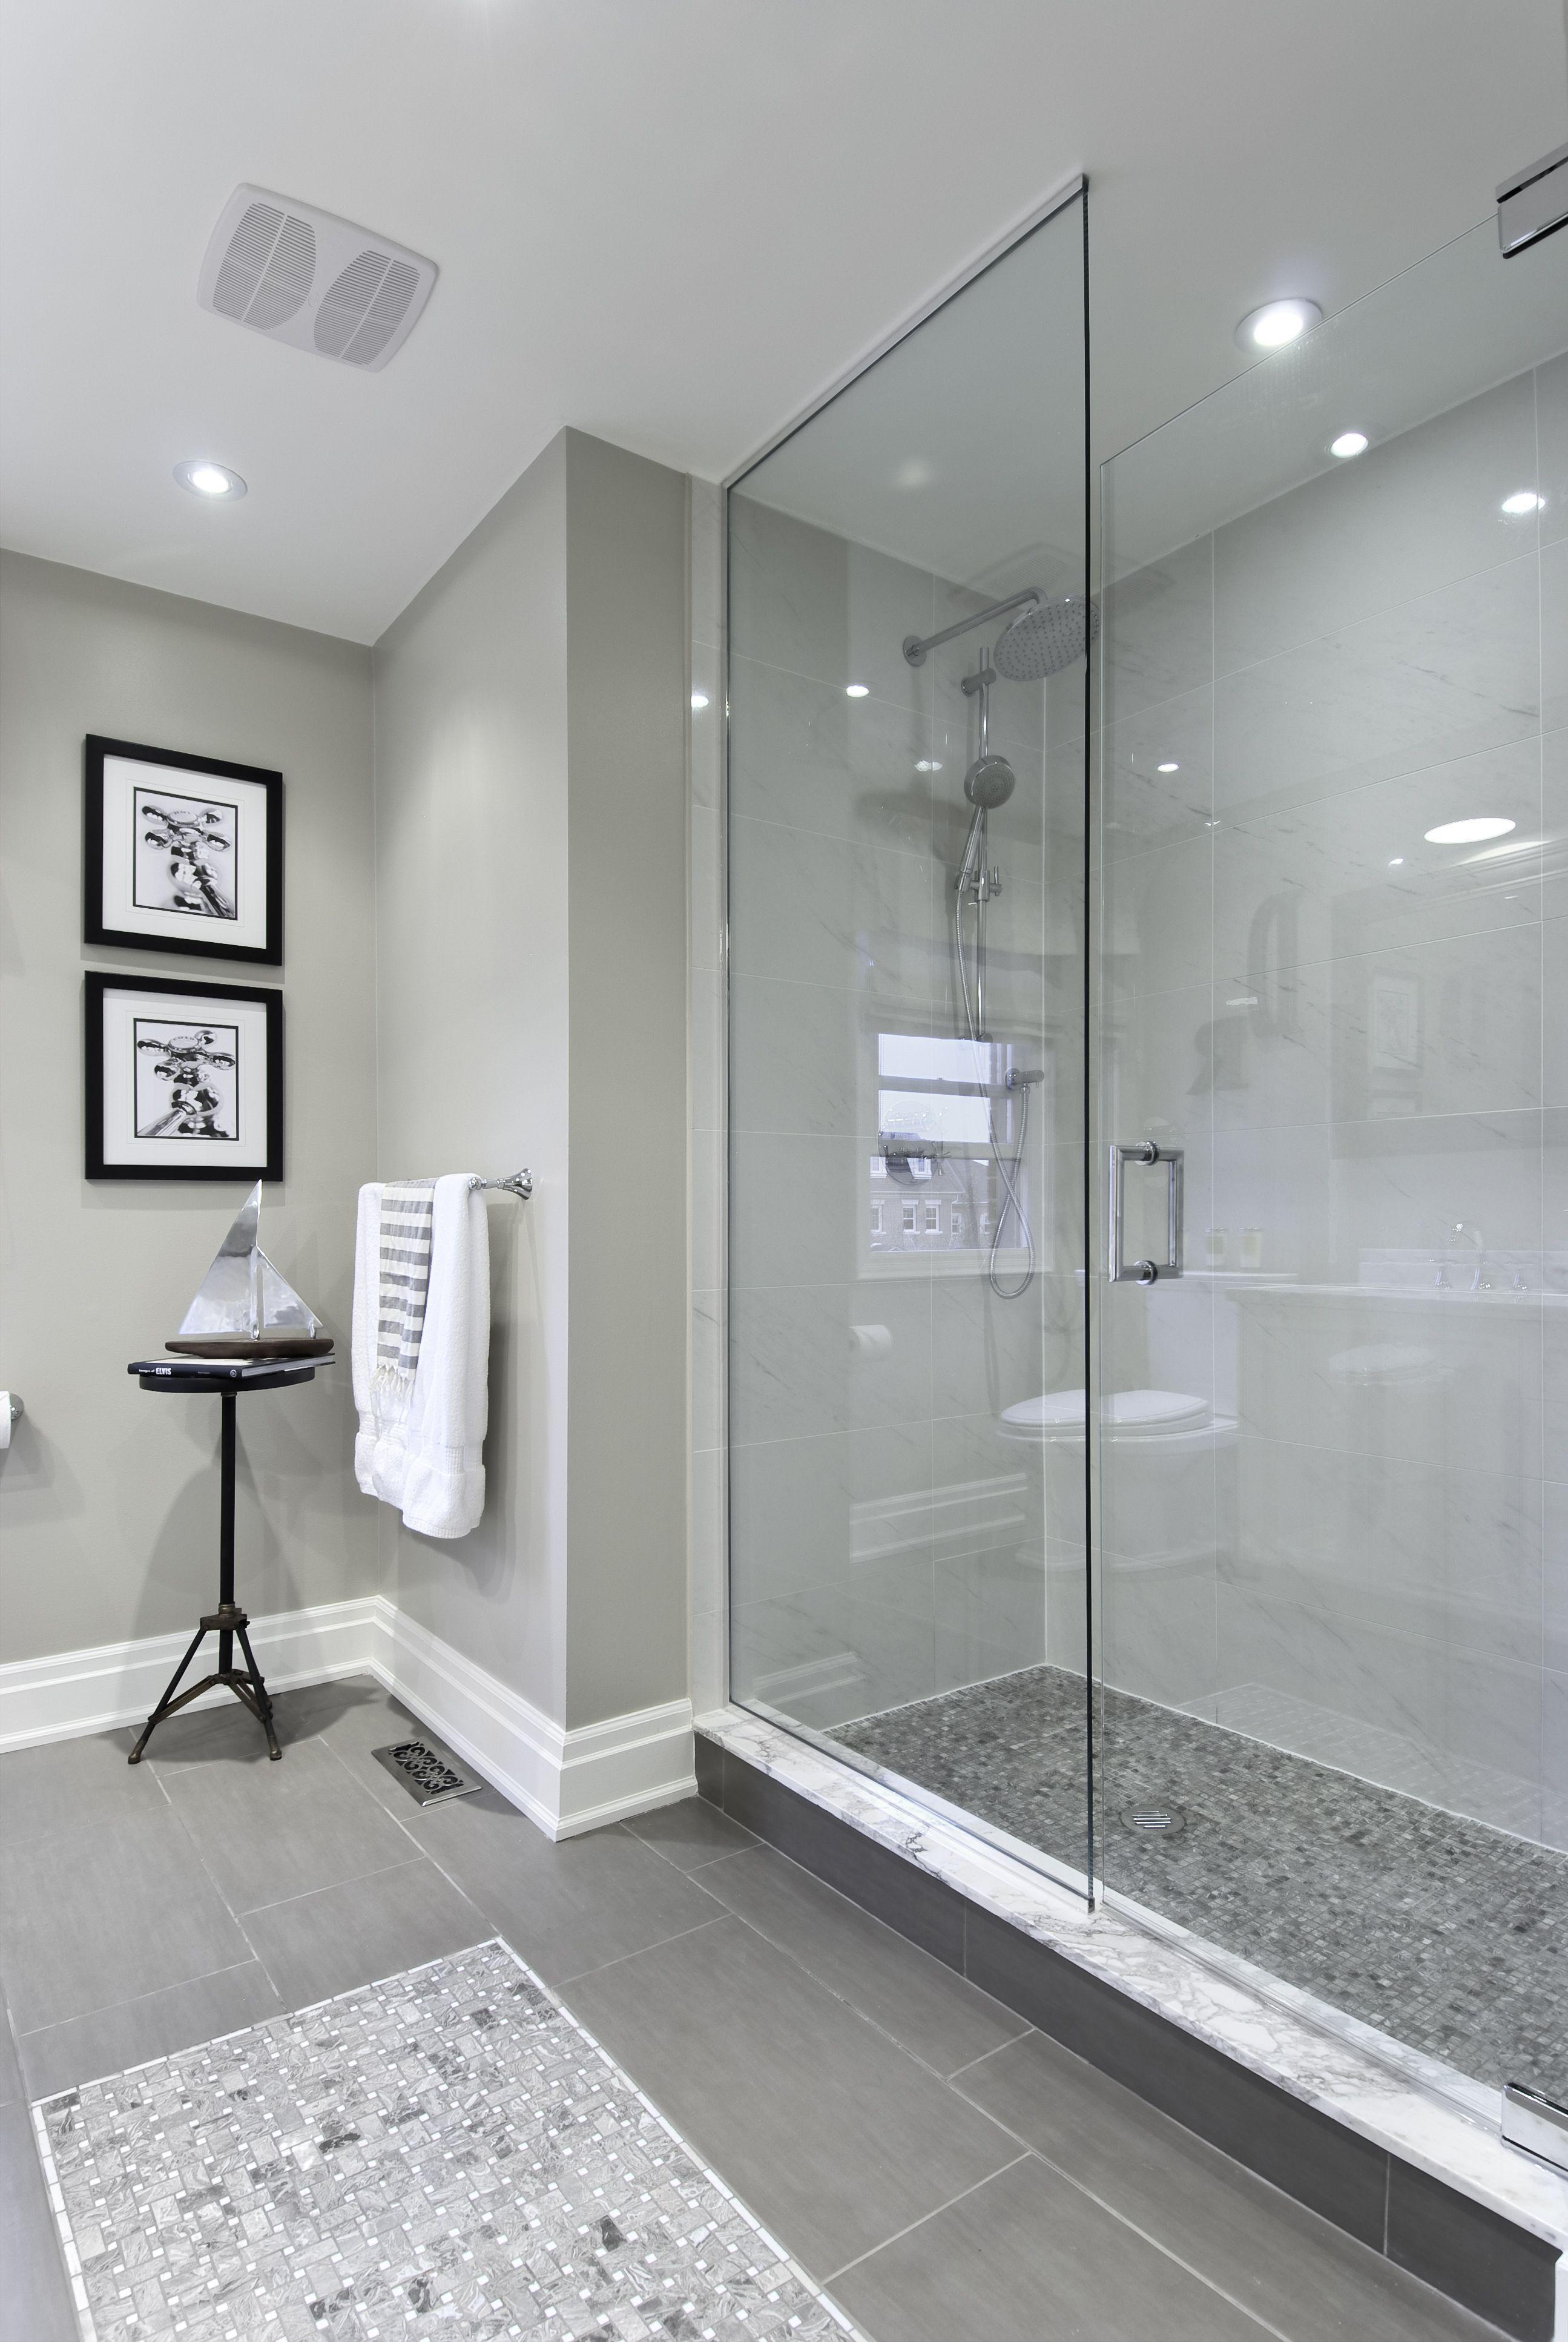 Bad ideen halbbäder would love this exact bathroom for master bath shower tile details